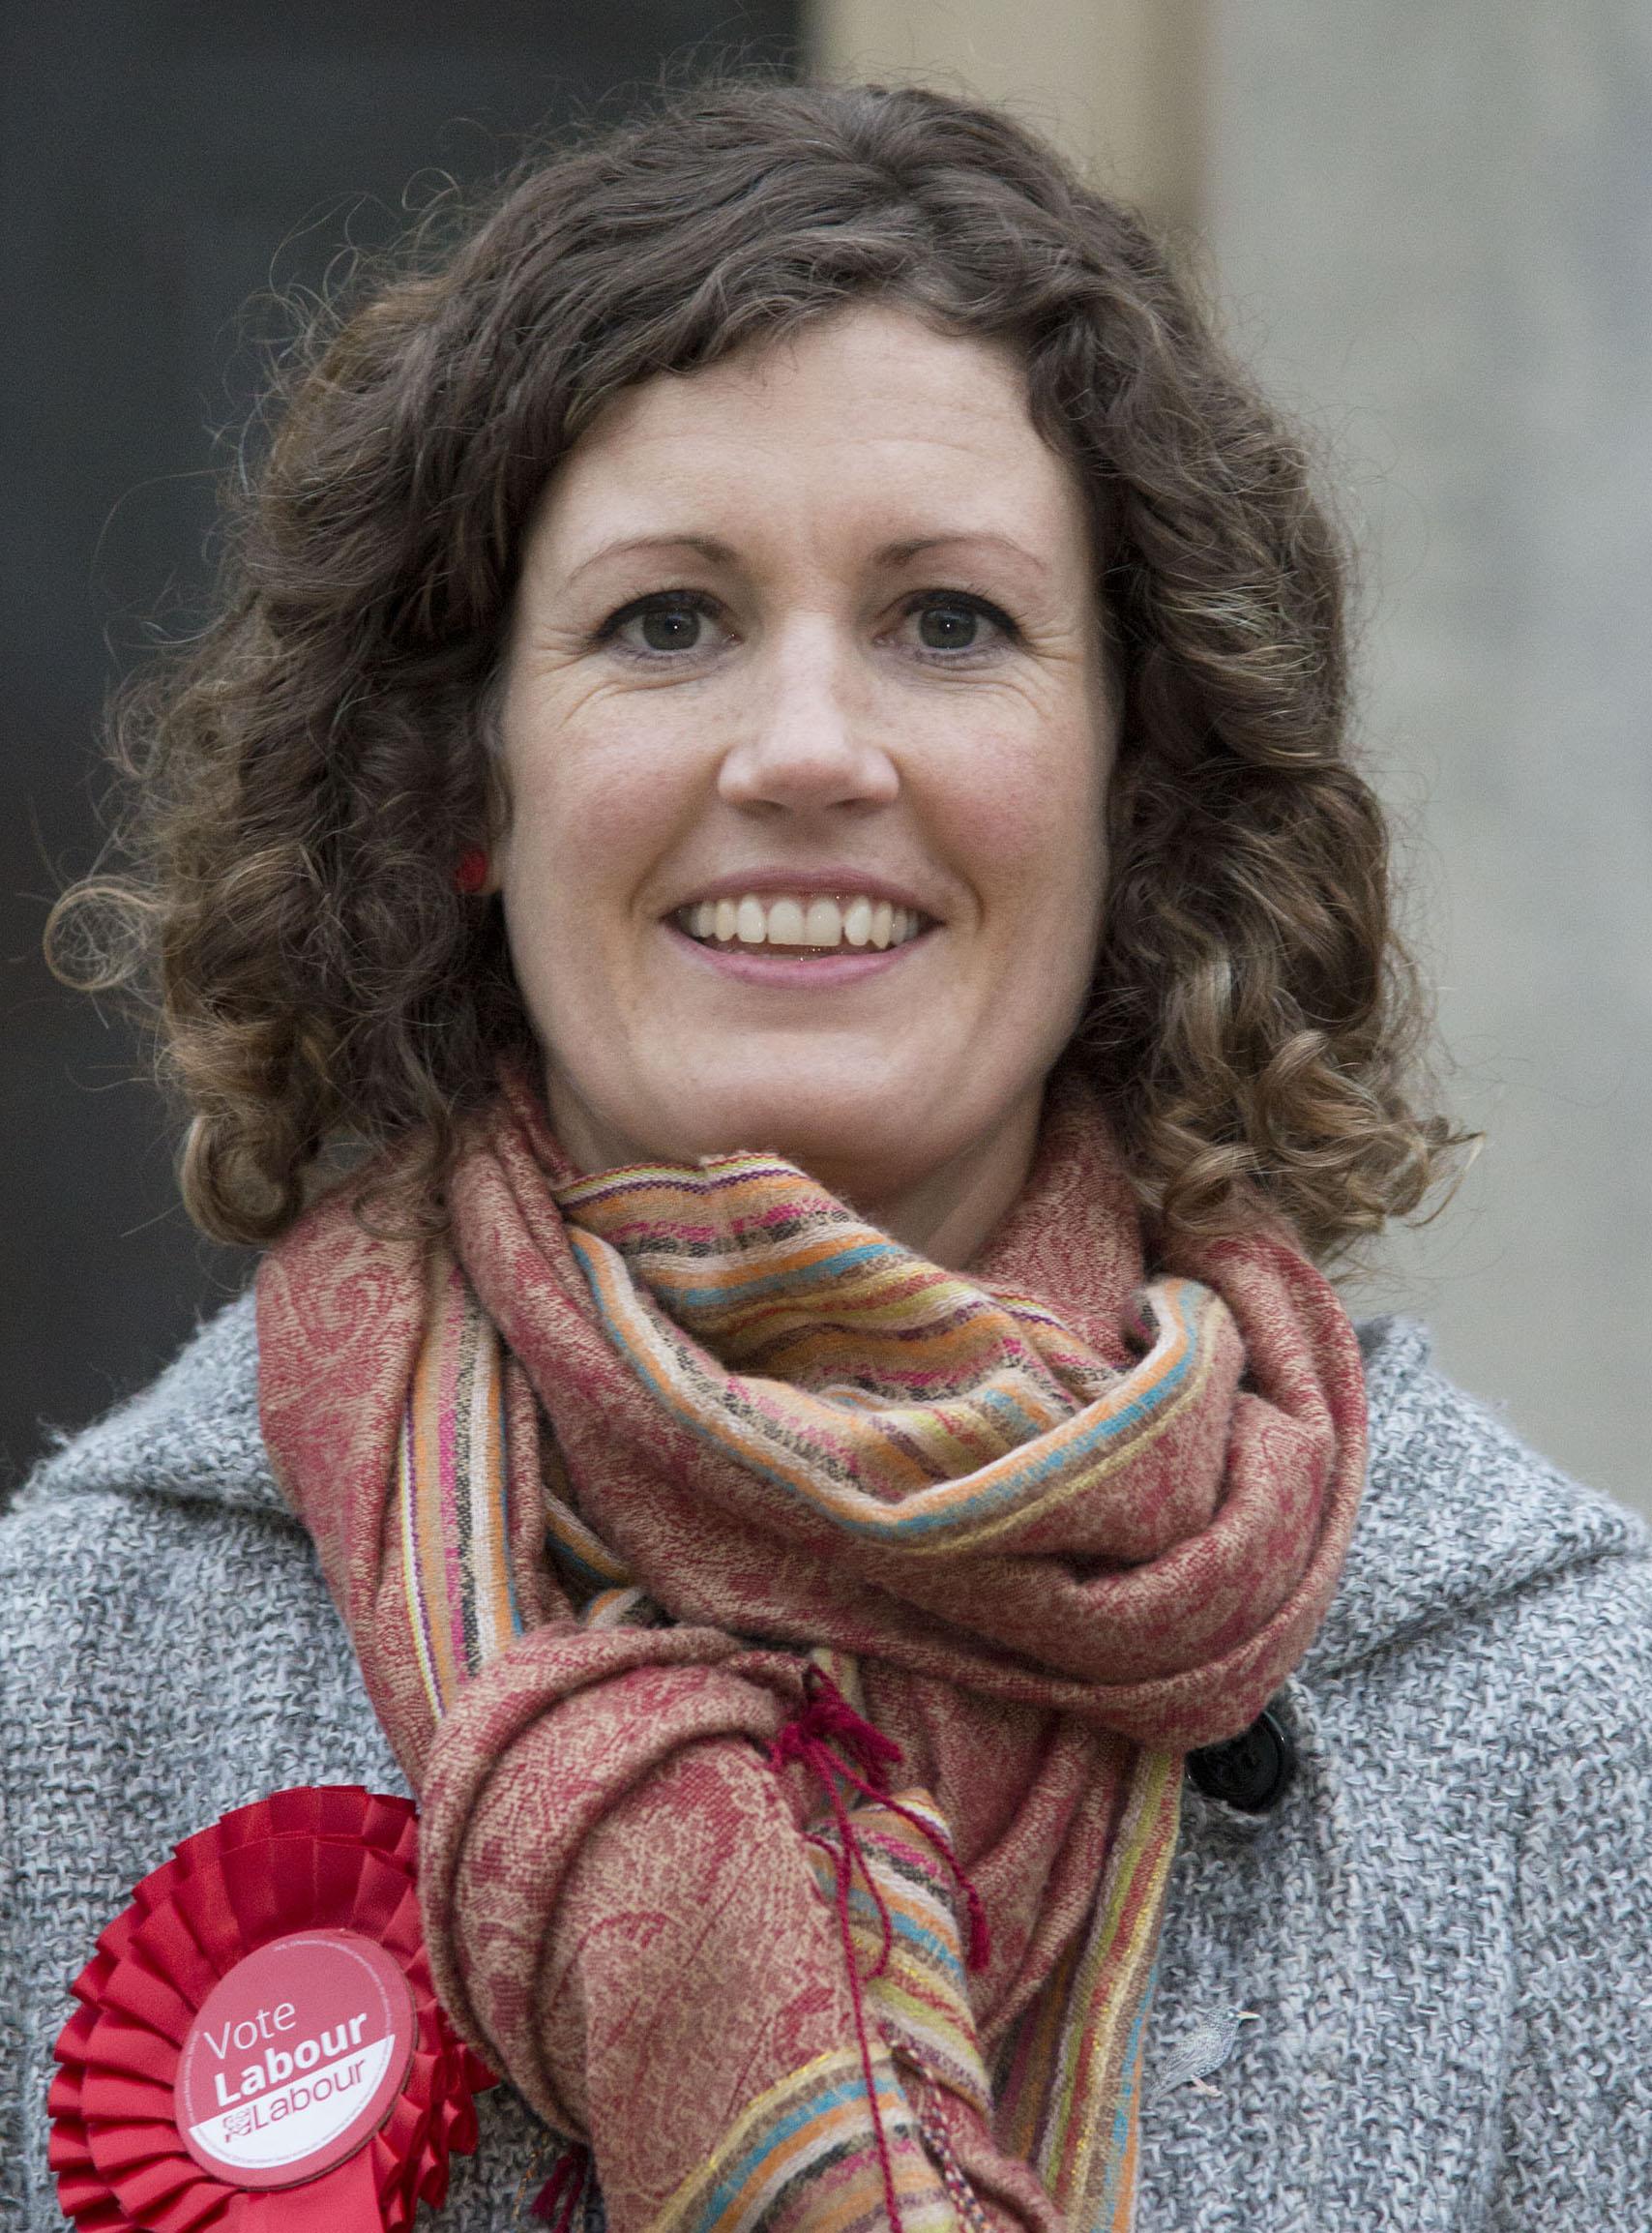 Lorna Beaumont